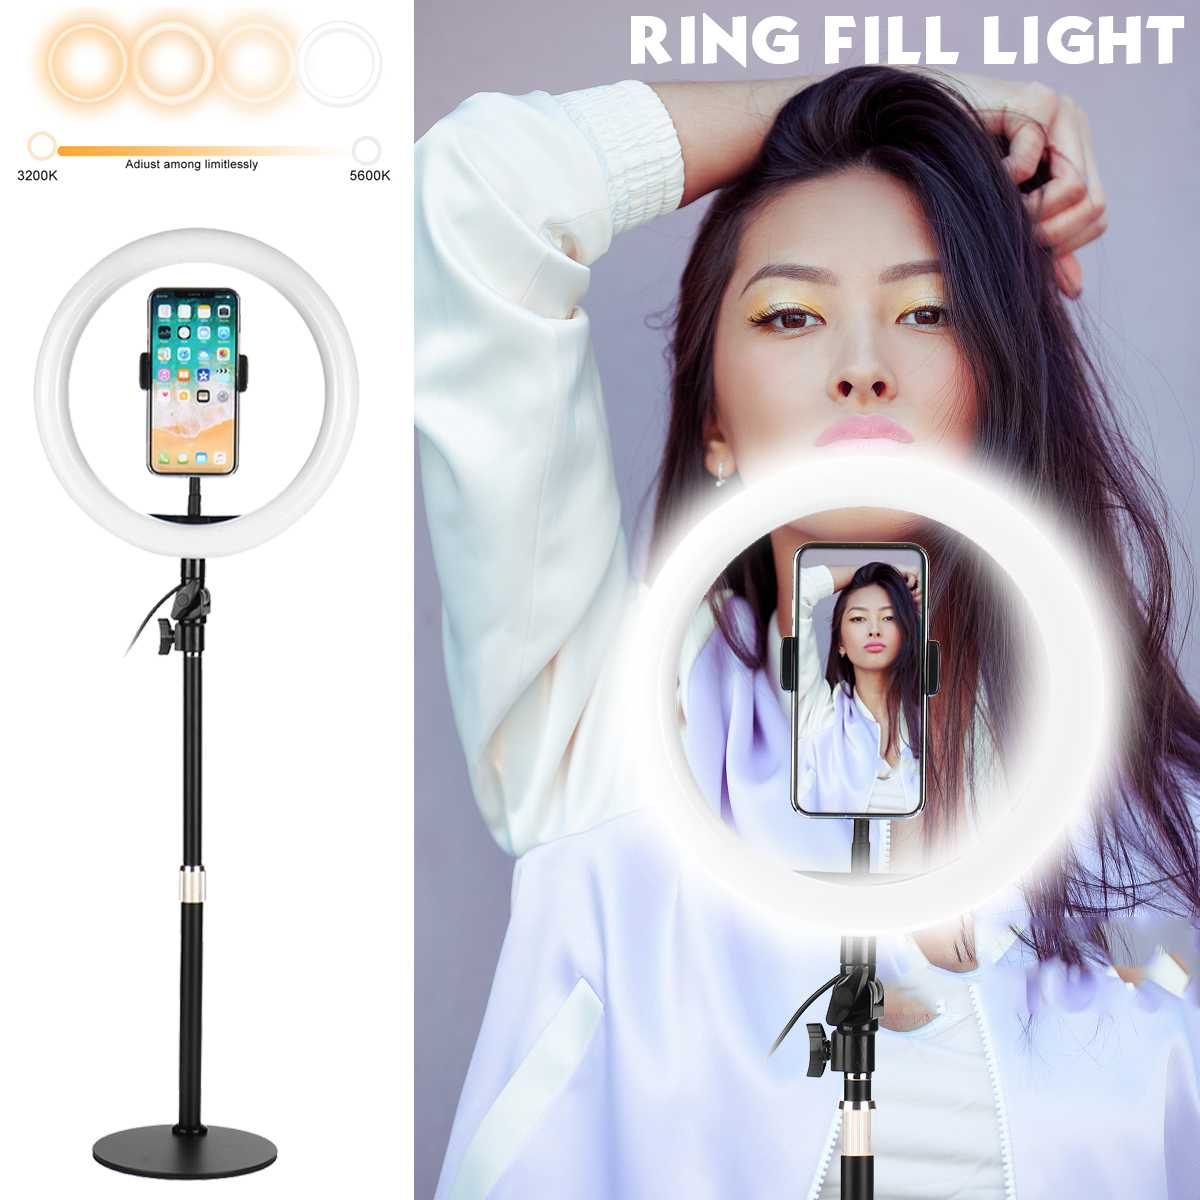 26cm USB LED Licht Ring Fotografie Blitz Lampe Mit Stand Für Make-Up Youtube VK Video Dimmbare Beleuchtung